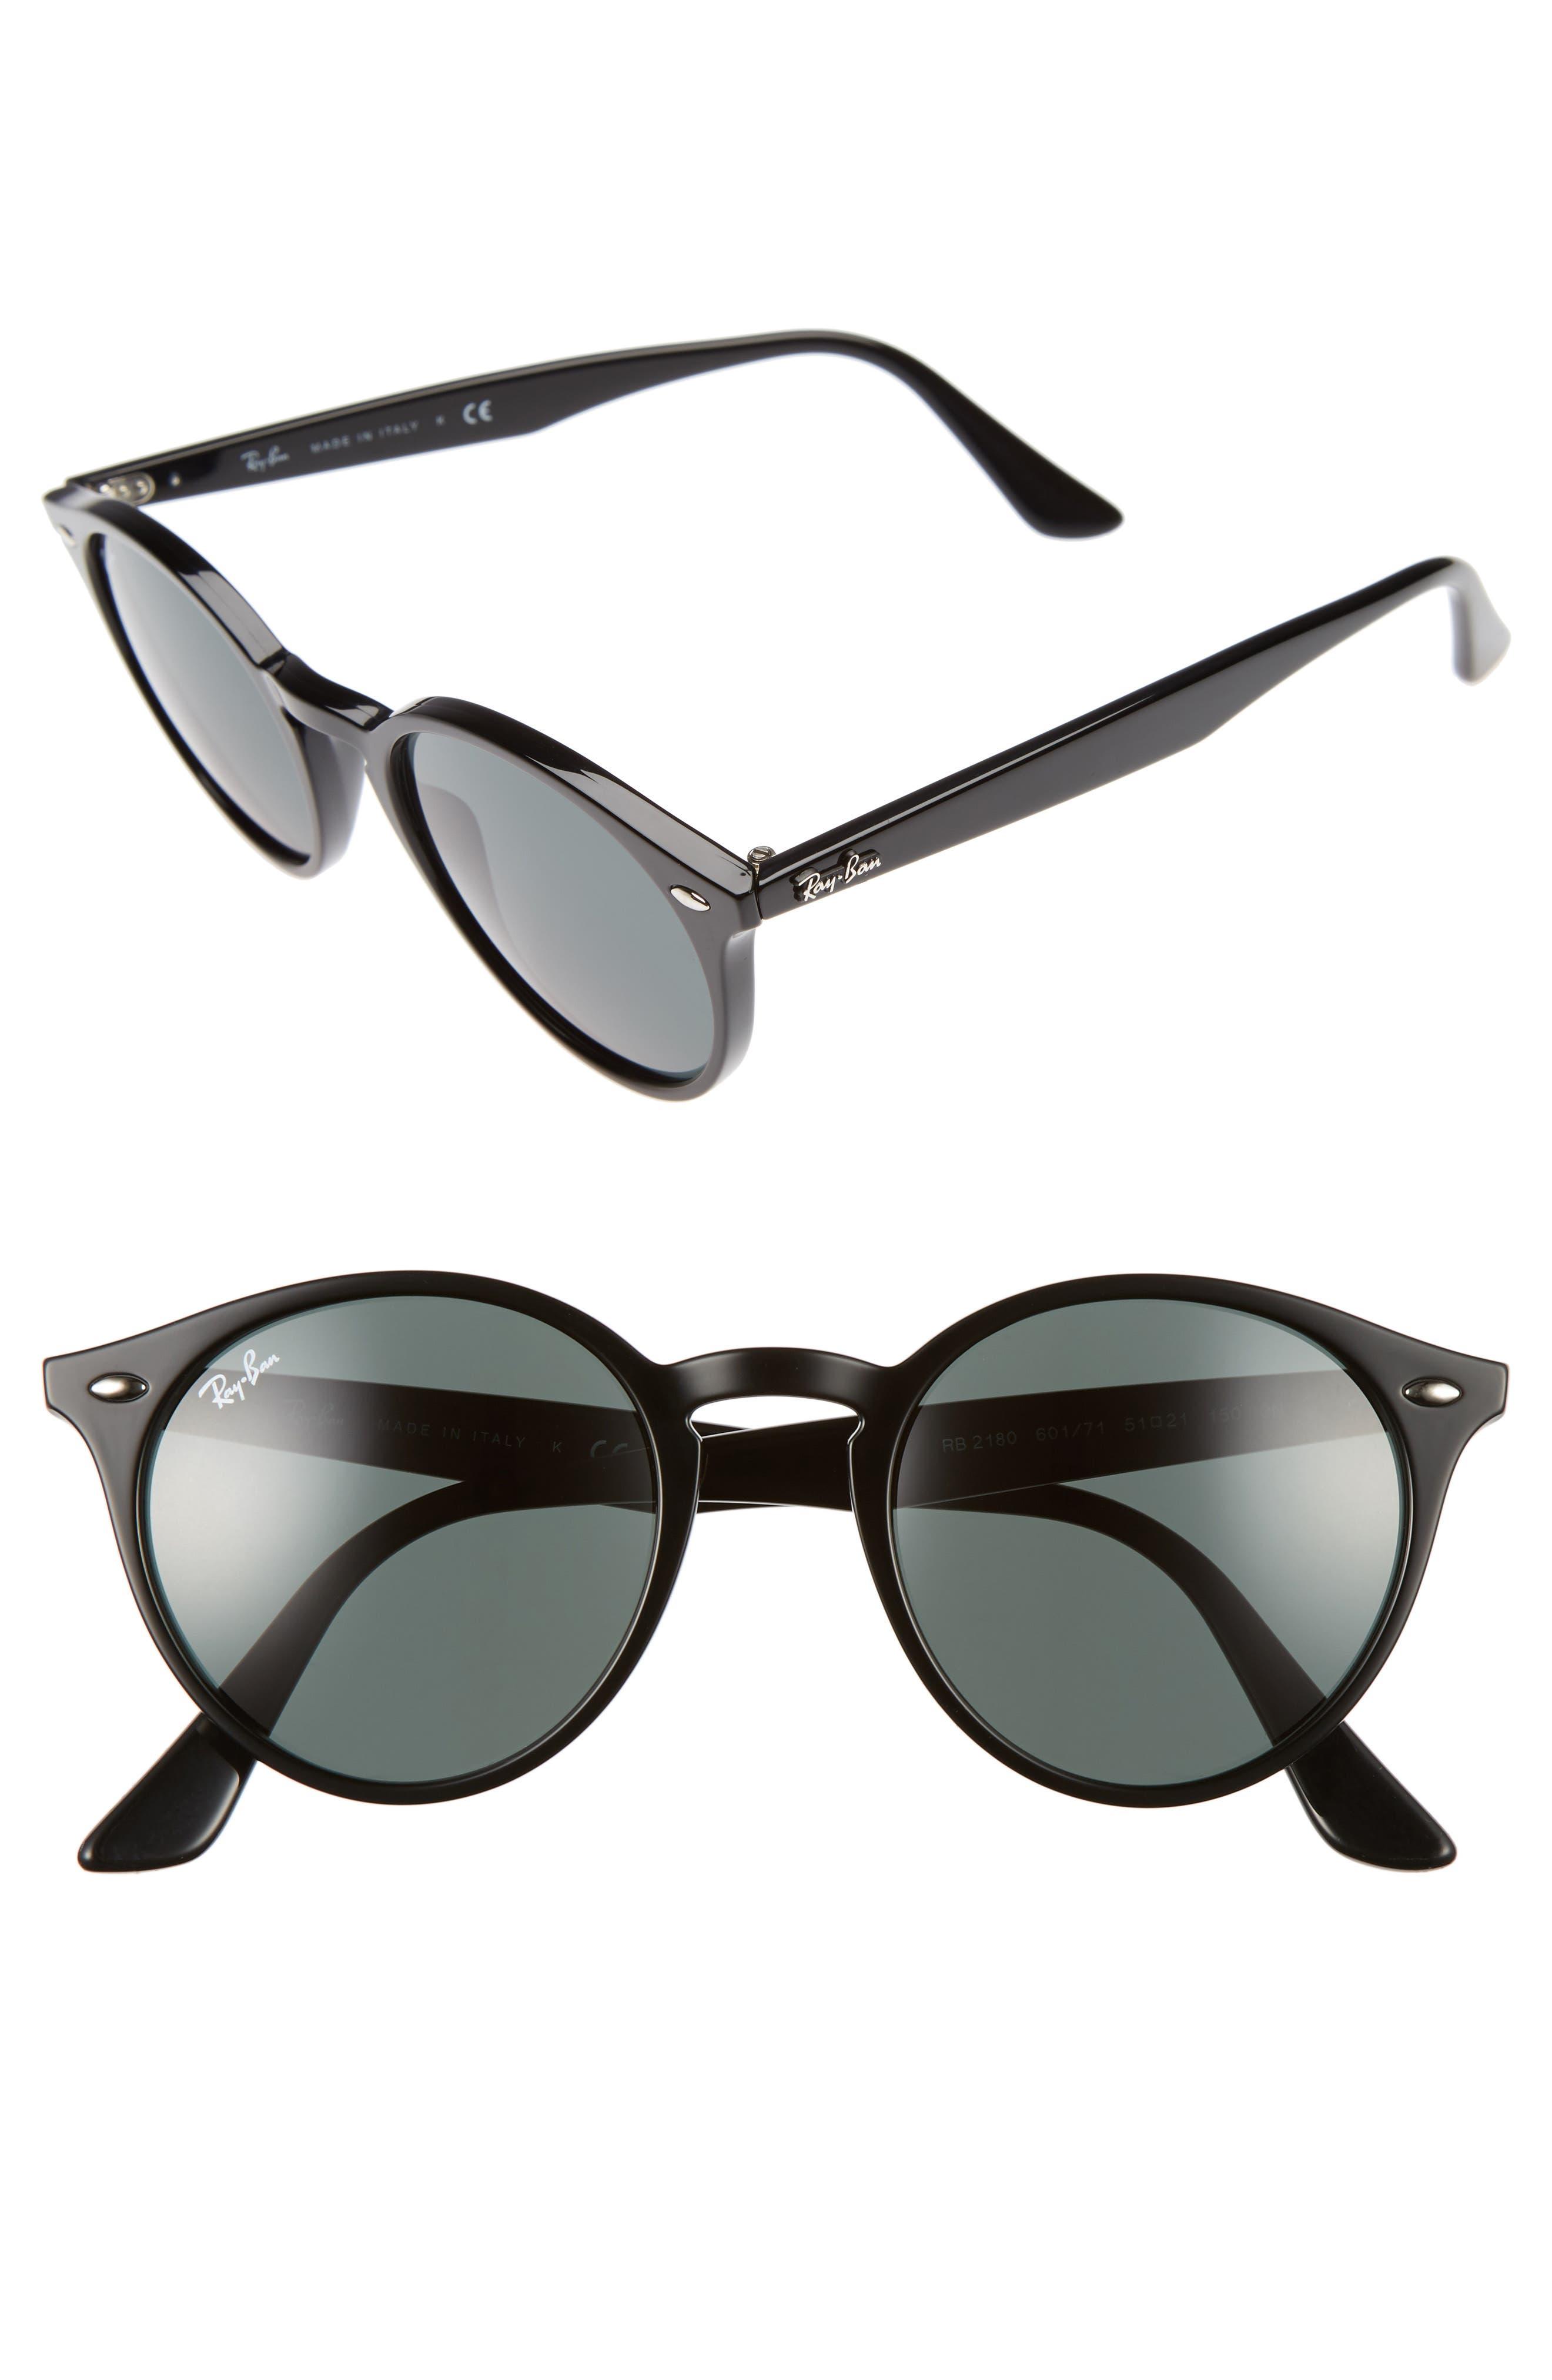 Ray-Ban Highstreet 51Mm Round Sunglasses - Black